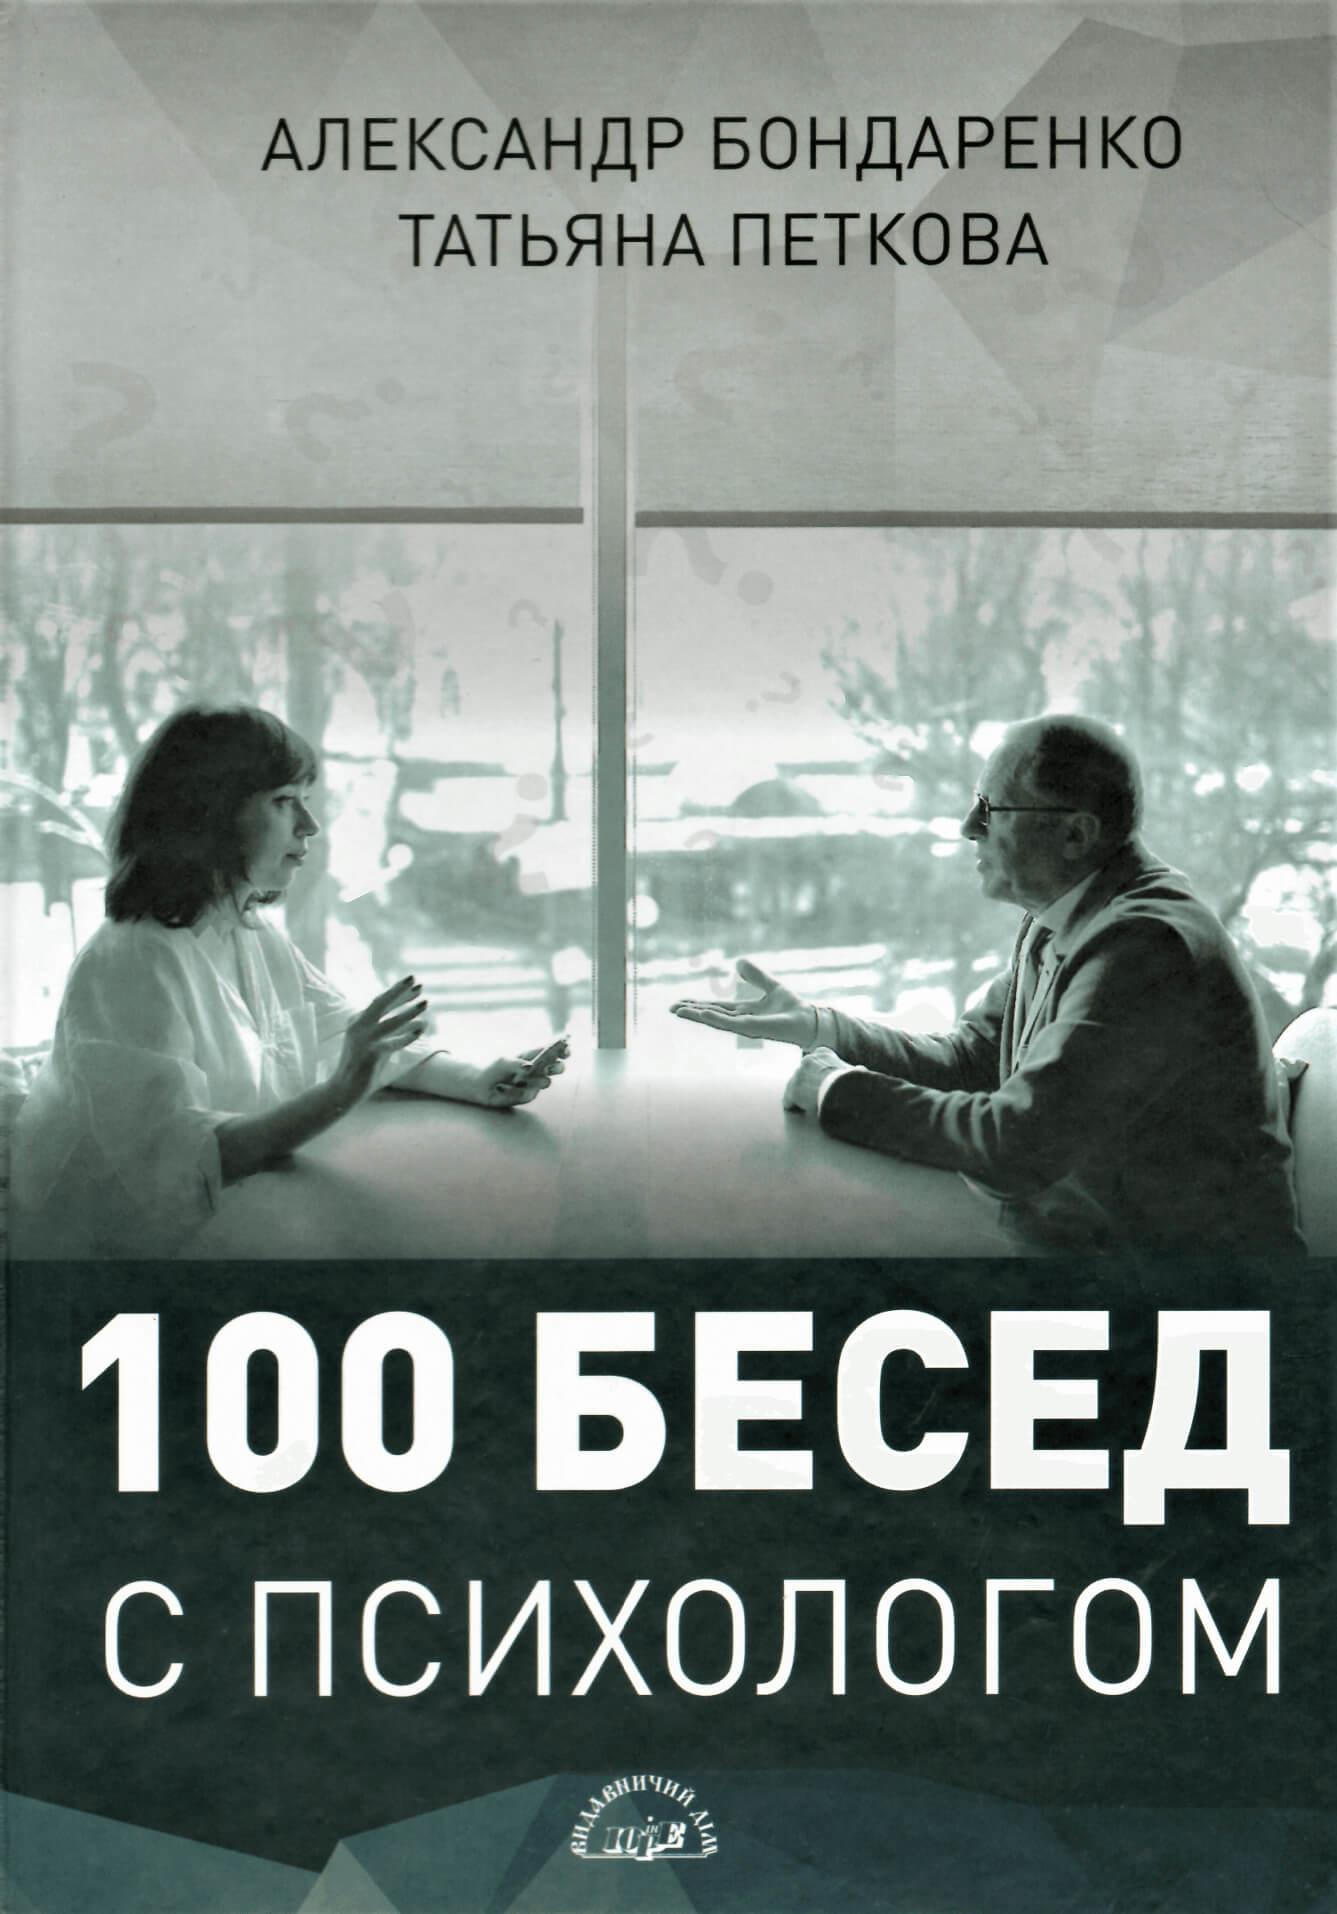 100 бесед с психологом